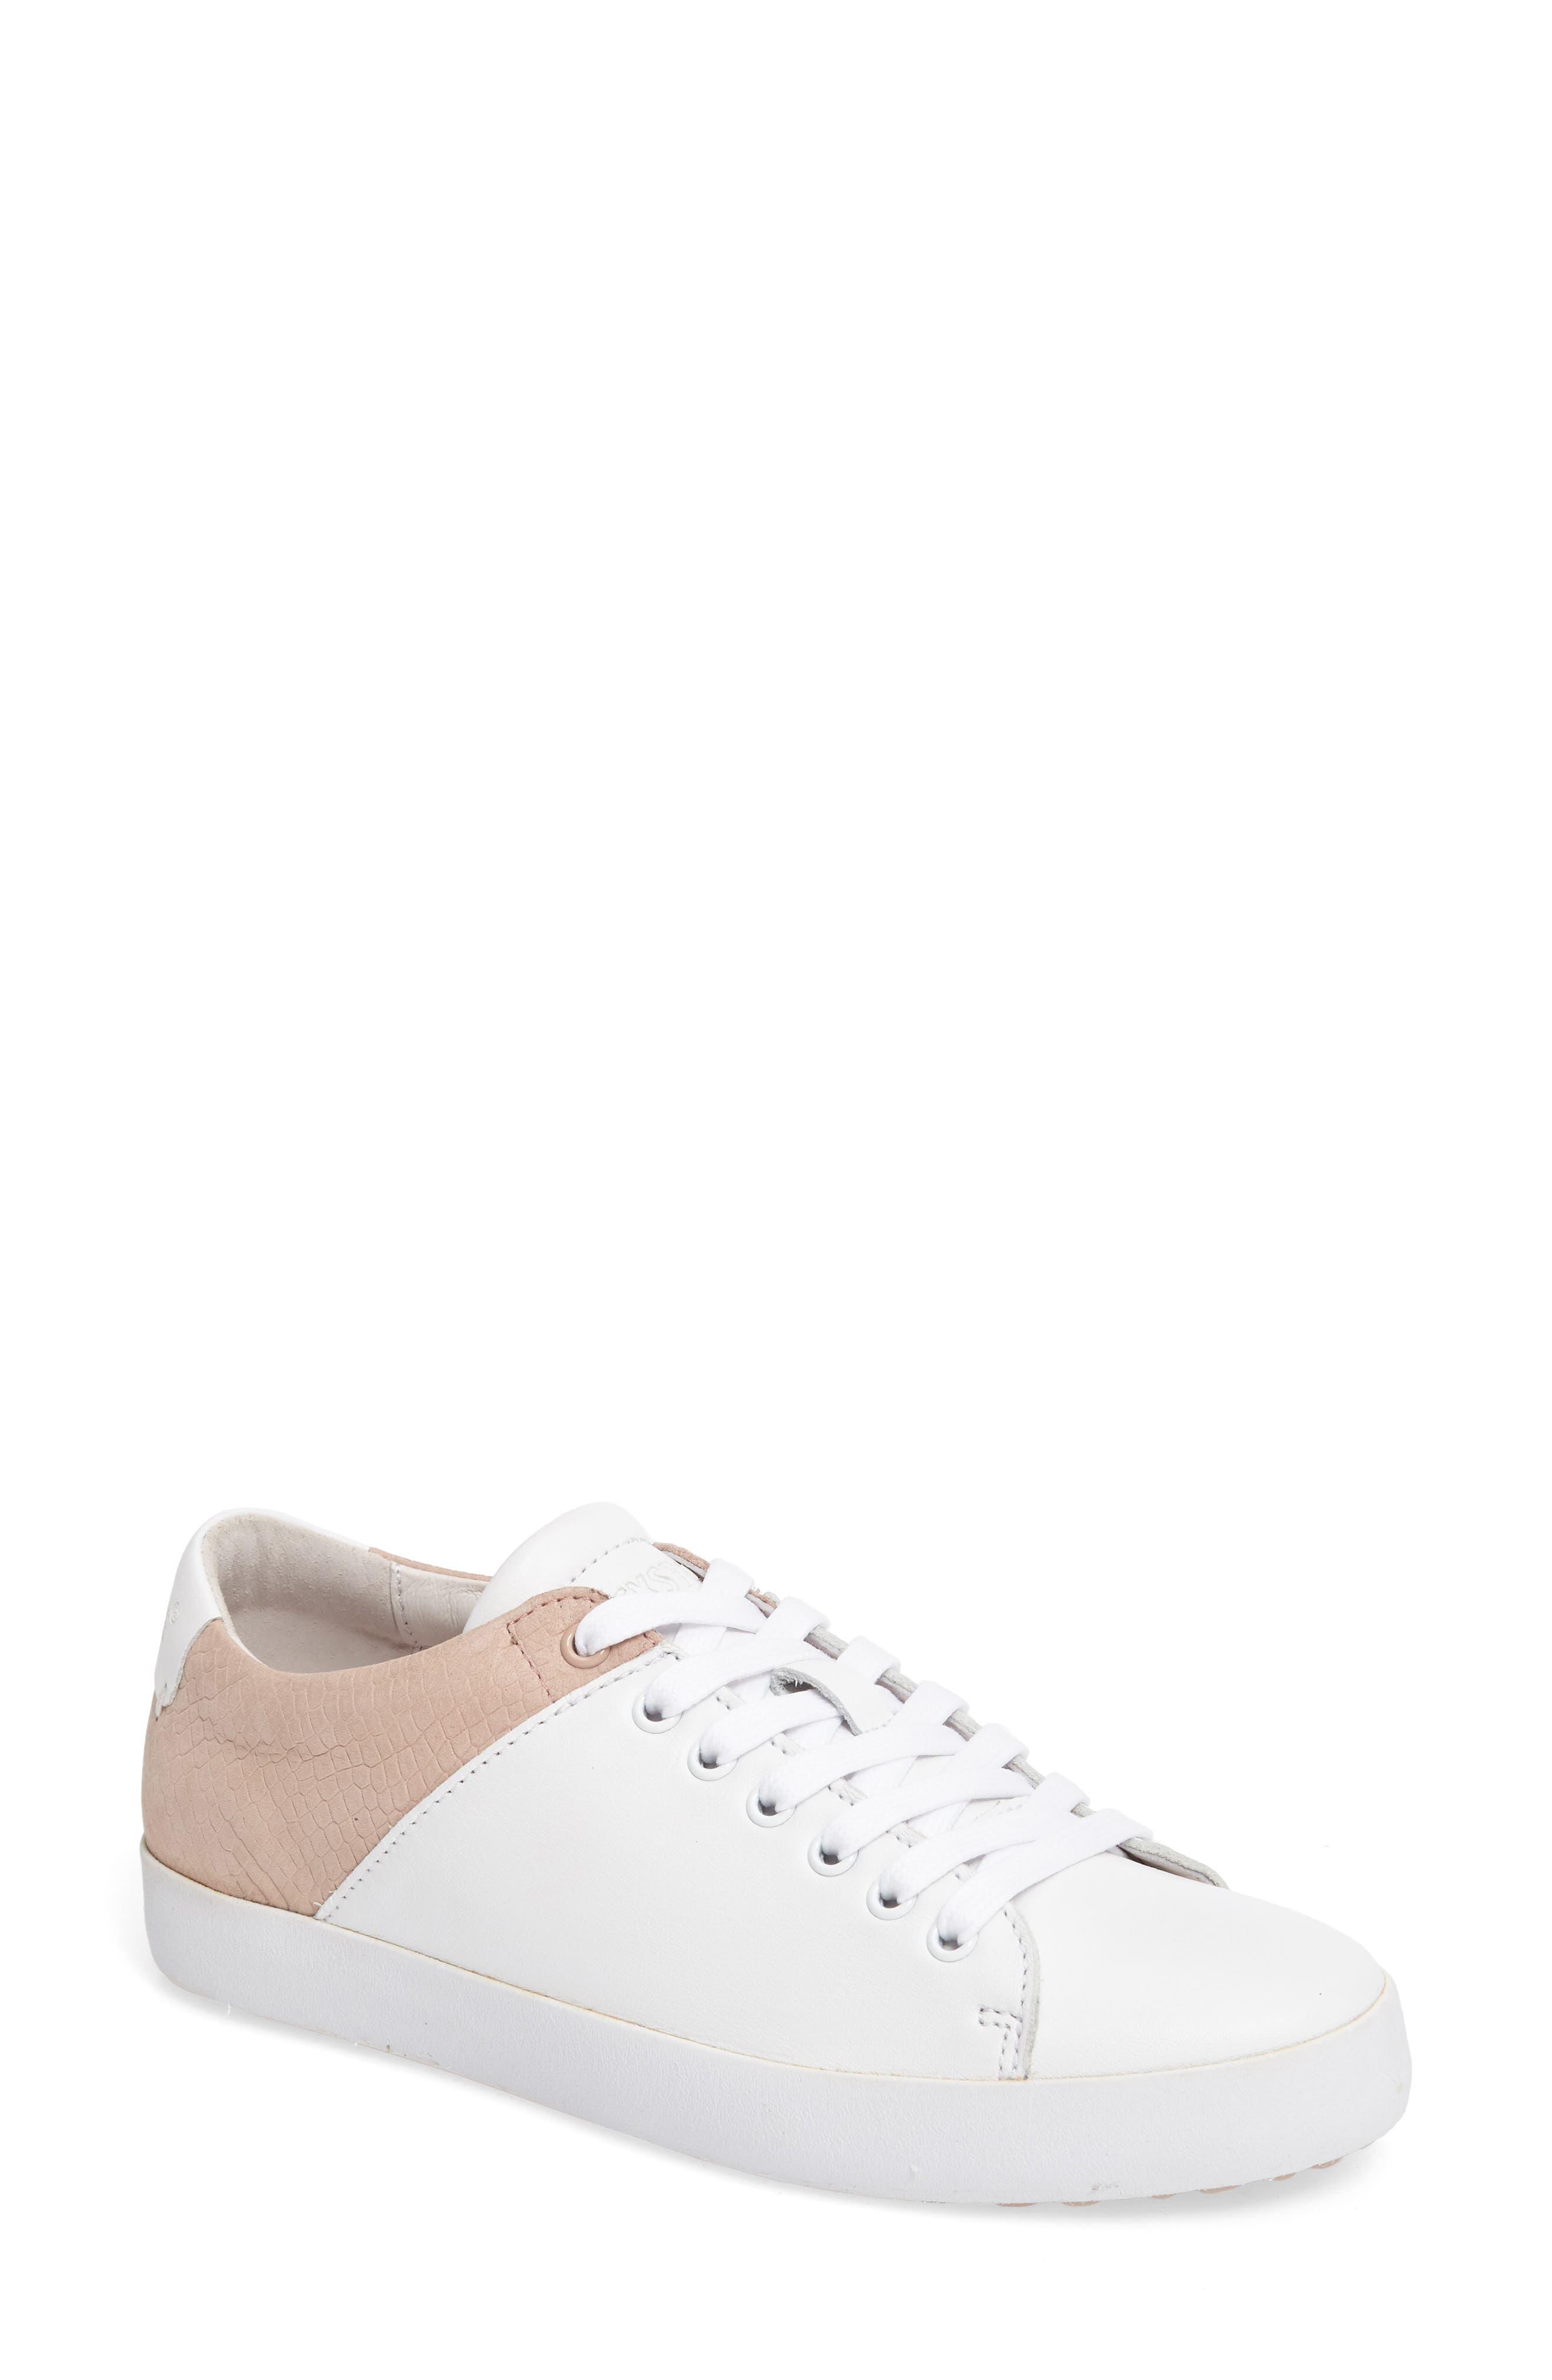 Main Image - Blackstone NL22 Sneaker (Women)